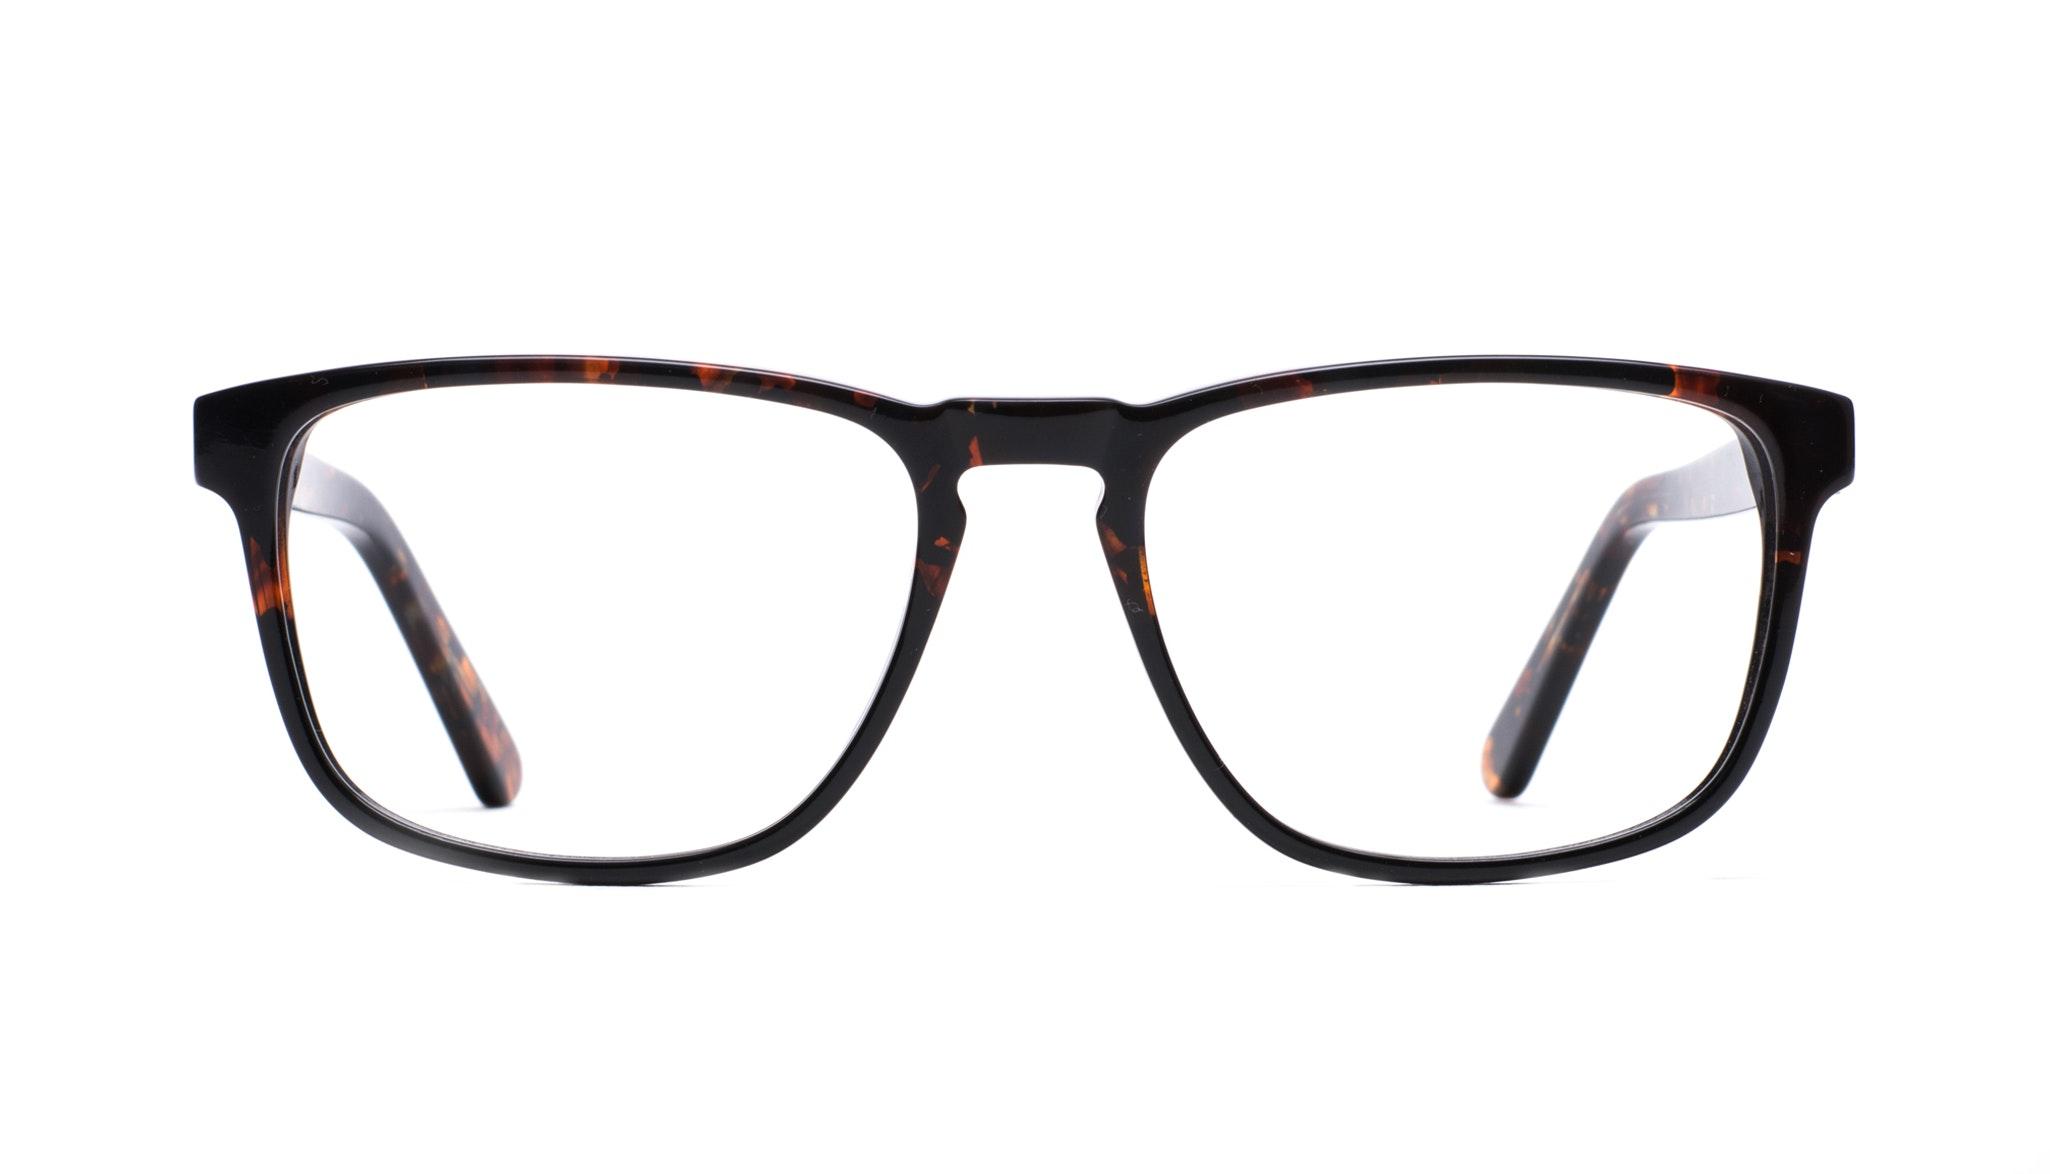 Affordable Fashion Glasses Rectangle Eyeglasses Men Loft Mahogany Black